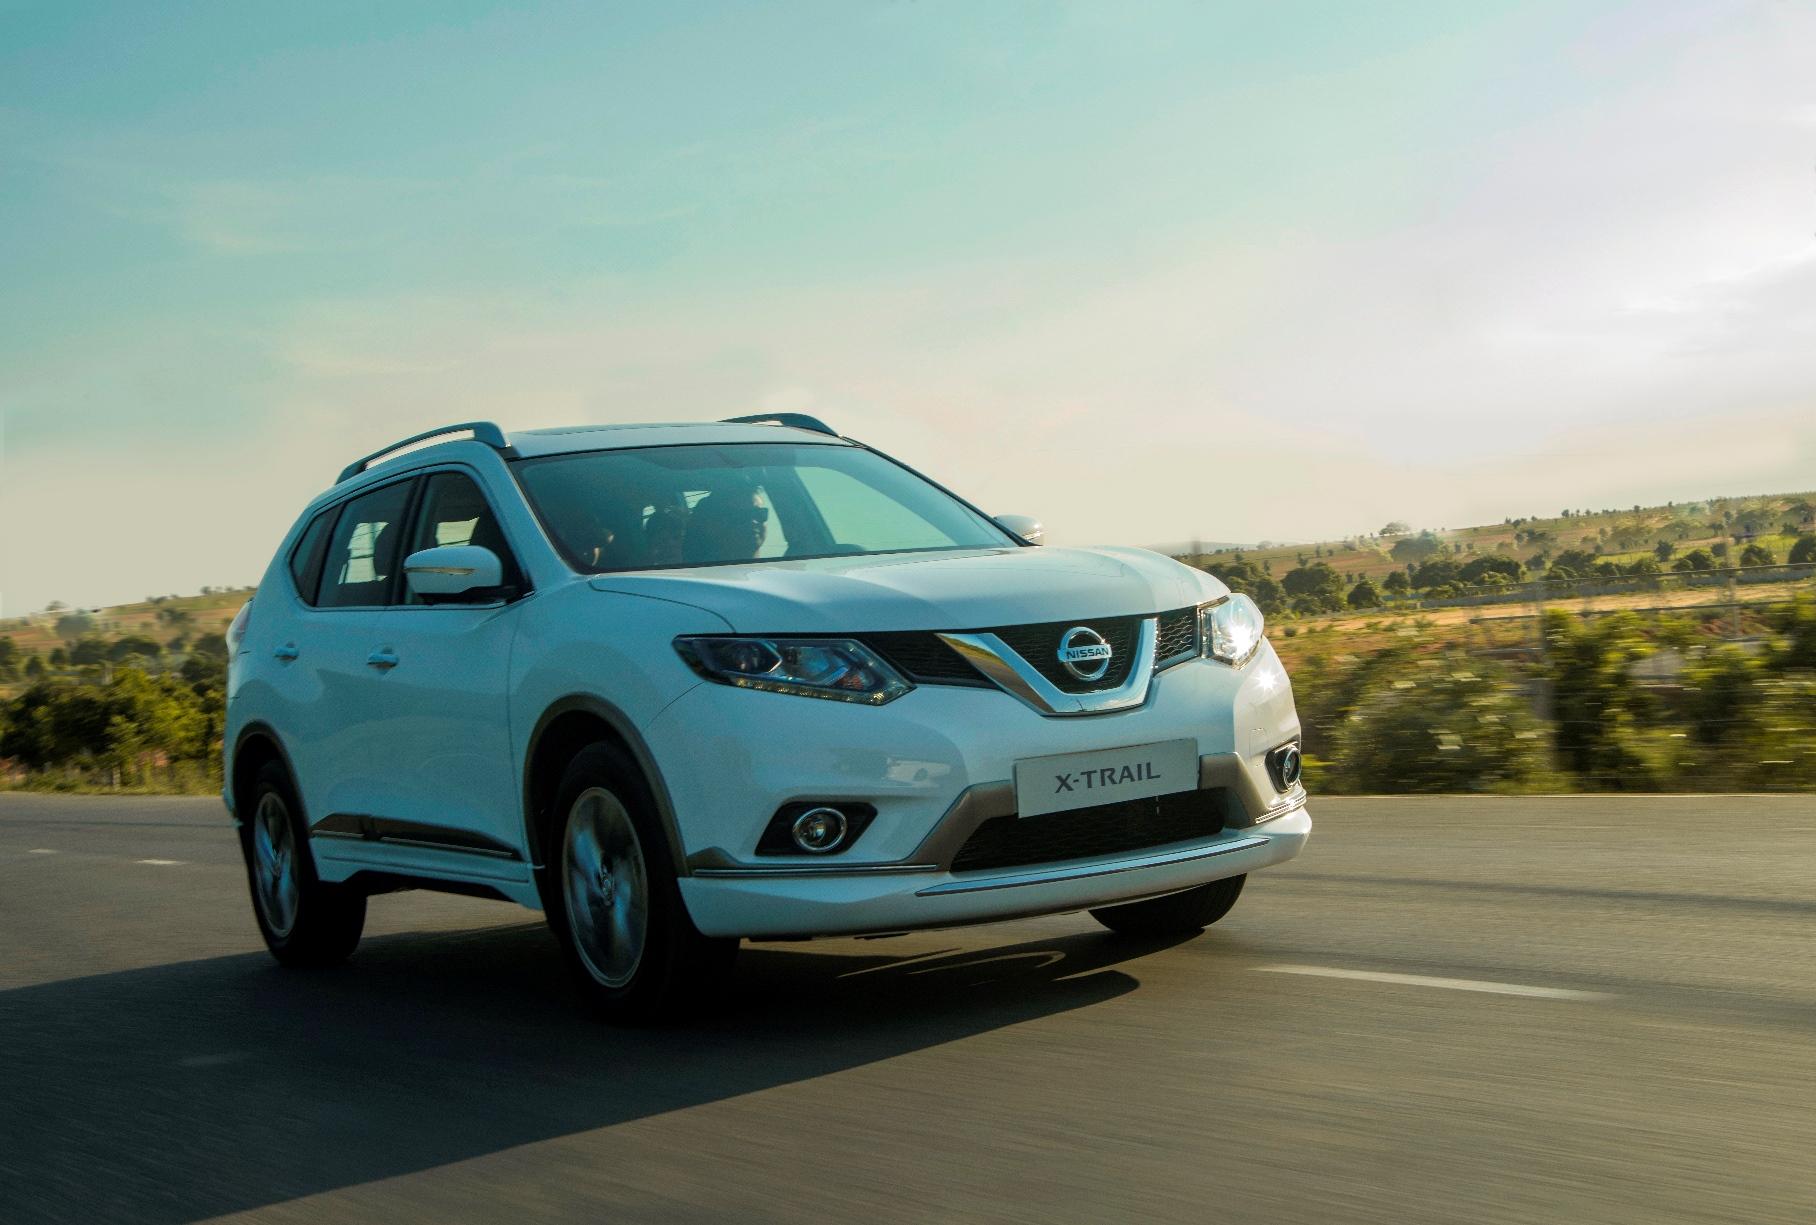 Nissan-Viet-Nam-tang-15-trieu-dong-tien-mat-hoac-phu-kien-trong-thang-9-2018-anh-1